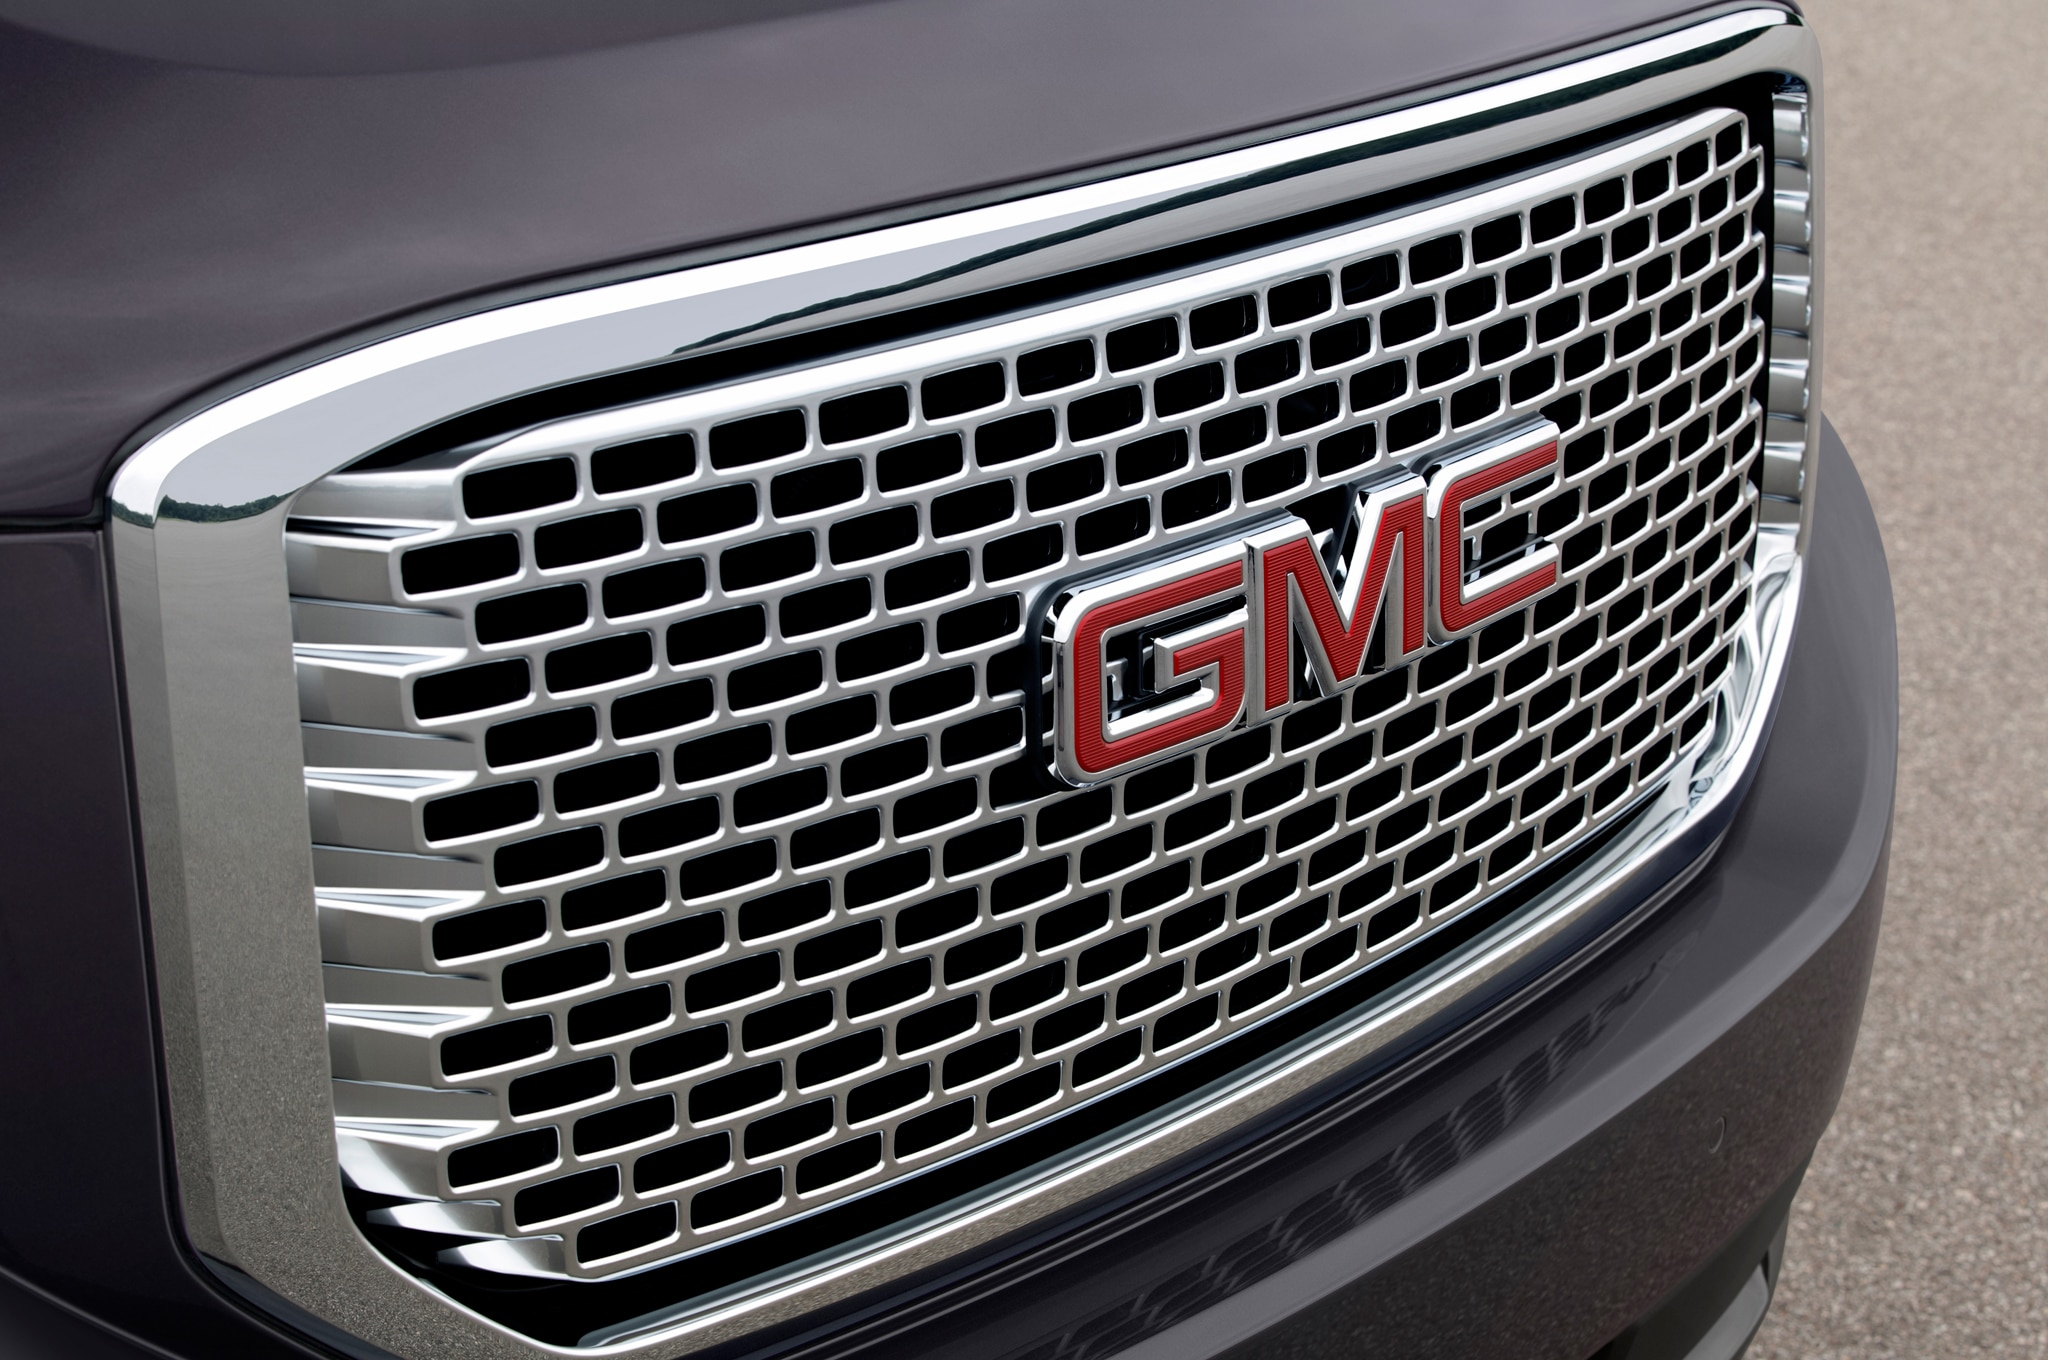 2015 Gmc Sierra Yukon Denali Fuel Economy Improves With